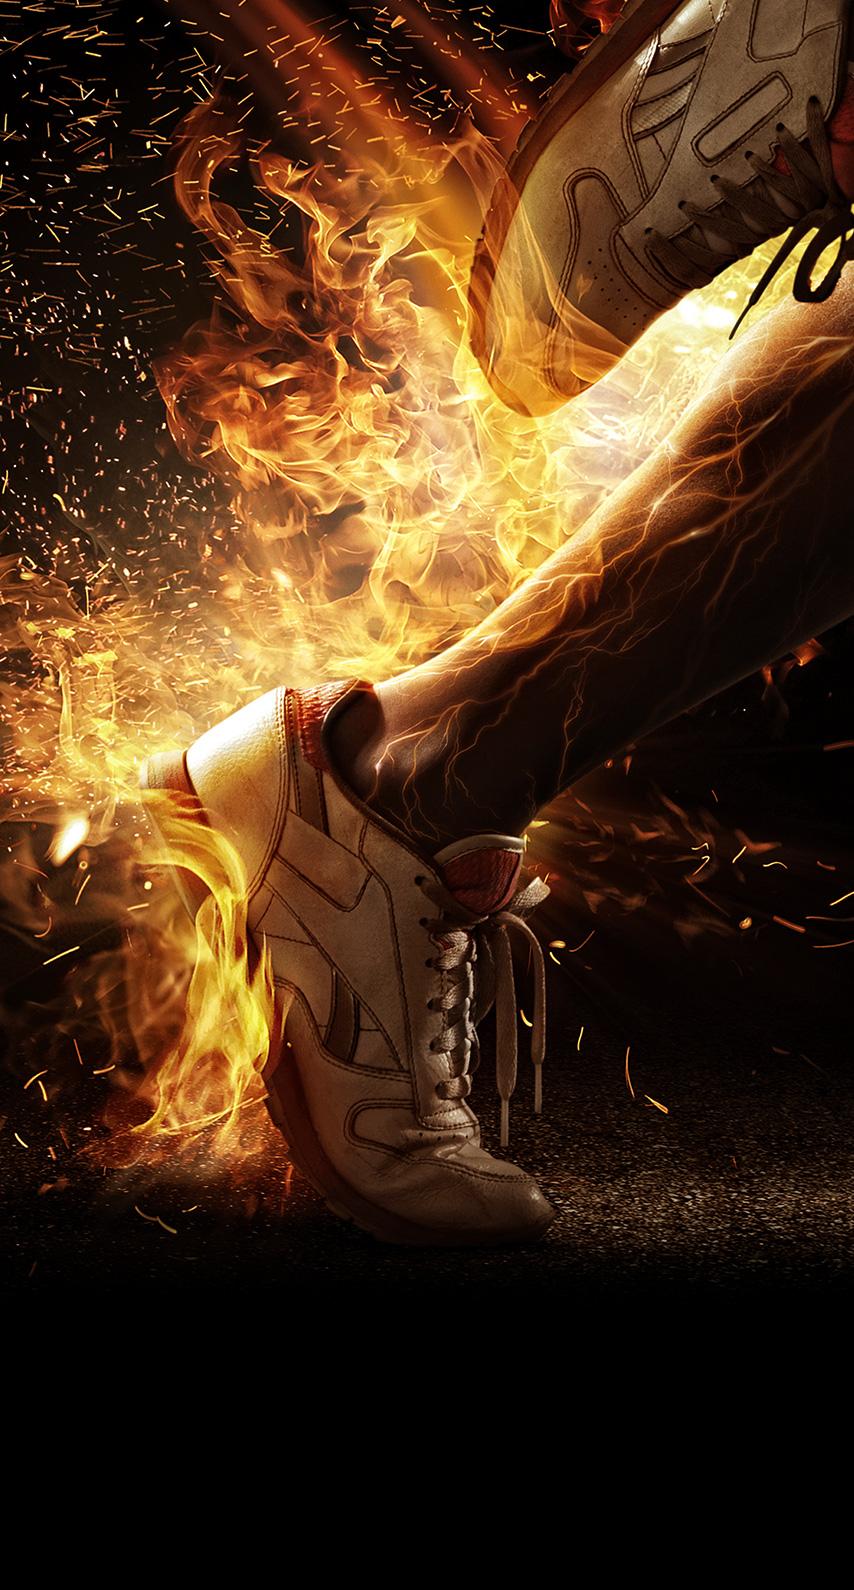 furnace, spark